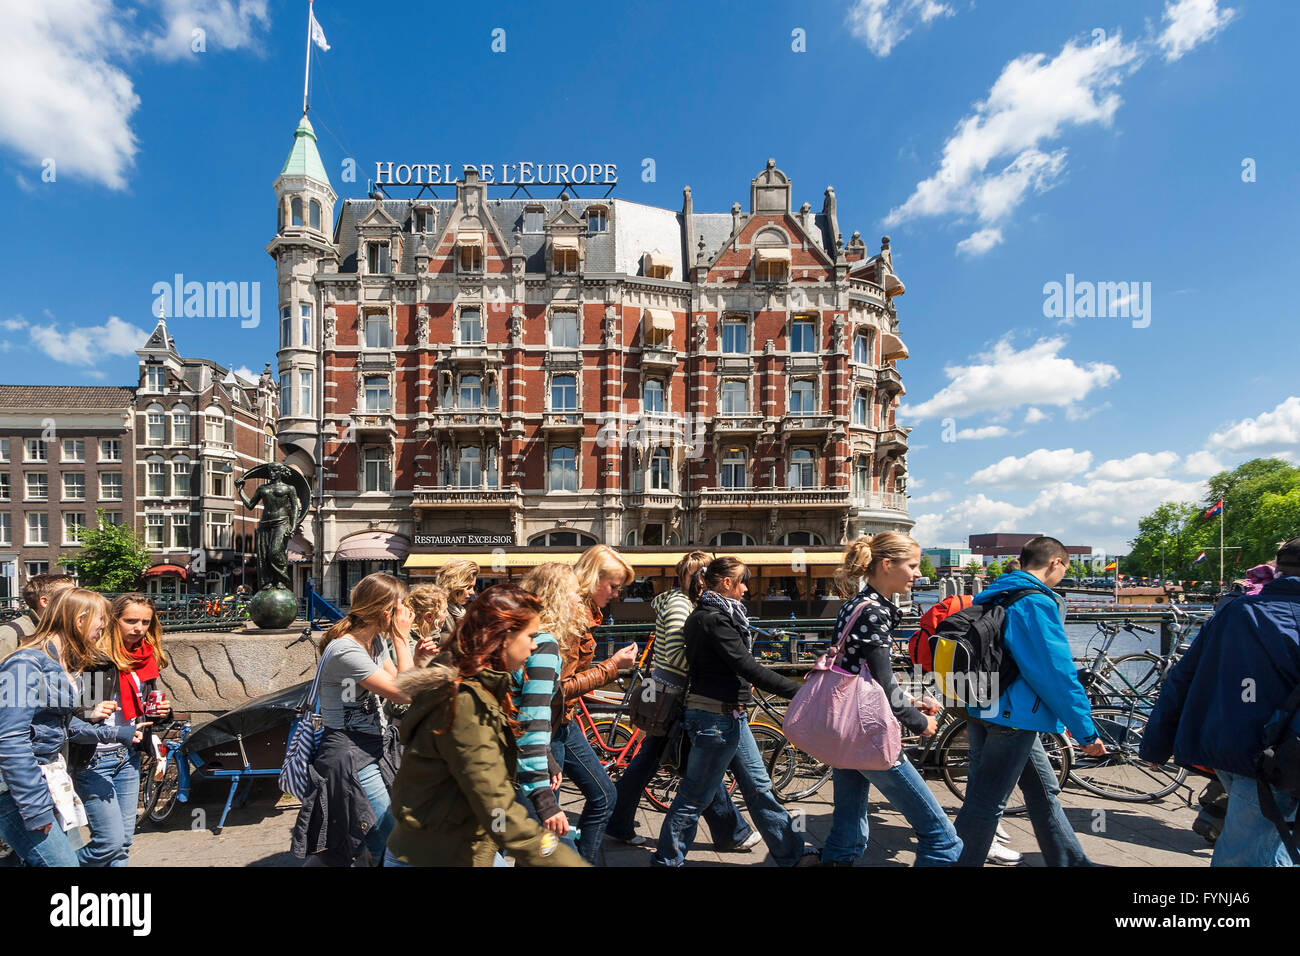 Amsterdam Hotel de l Europe school class Amsterdam, Netherlands Stock Photo